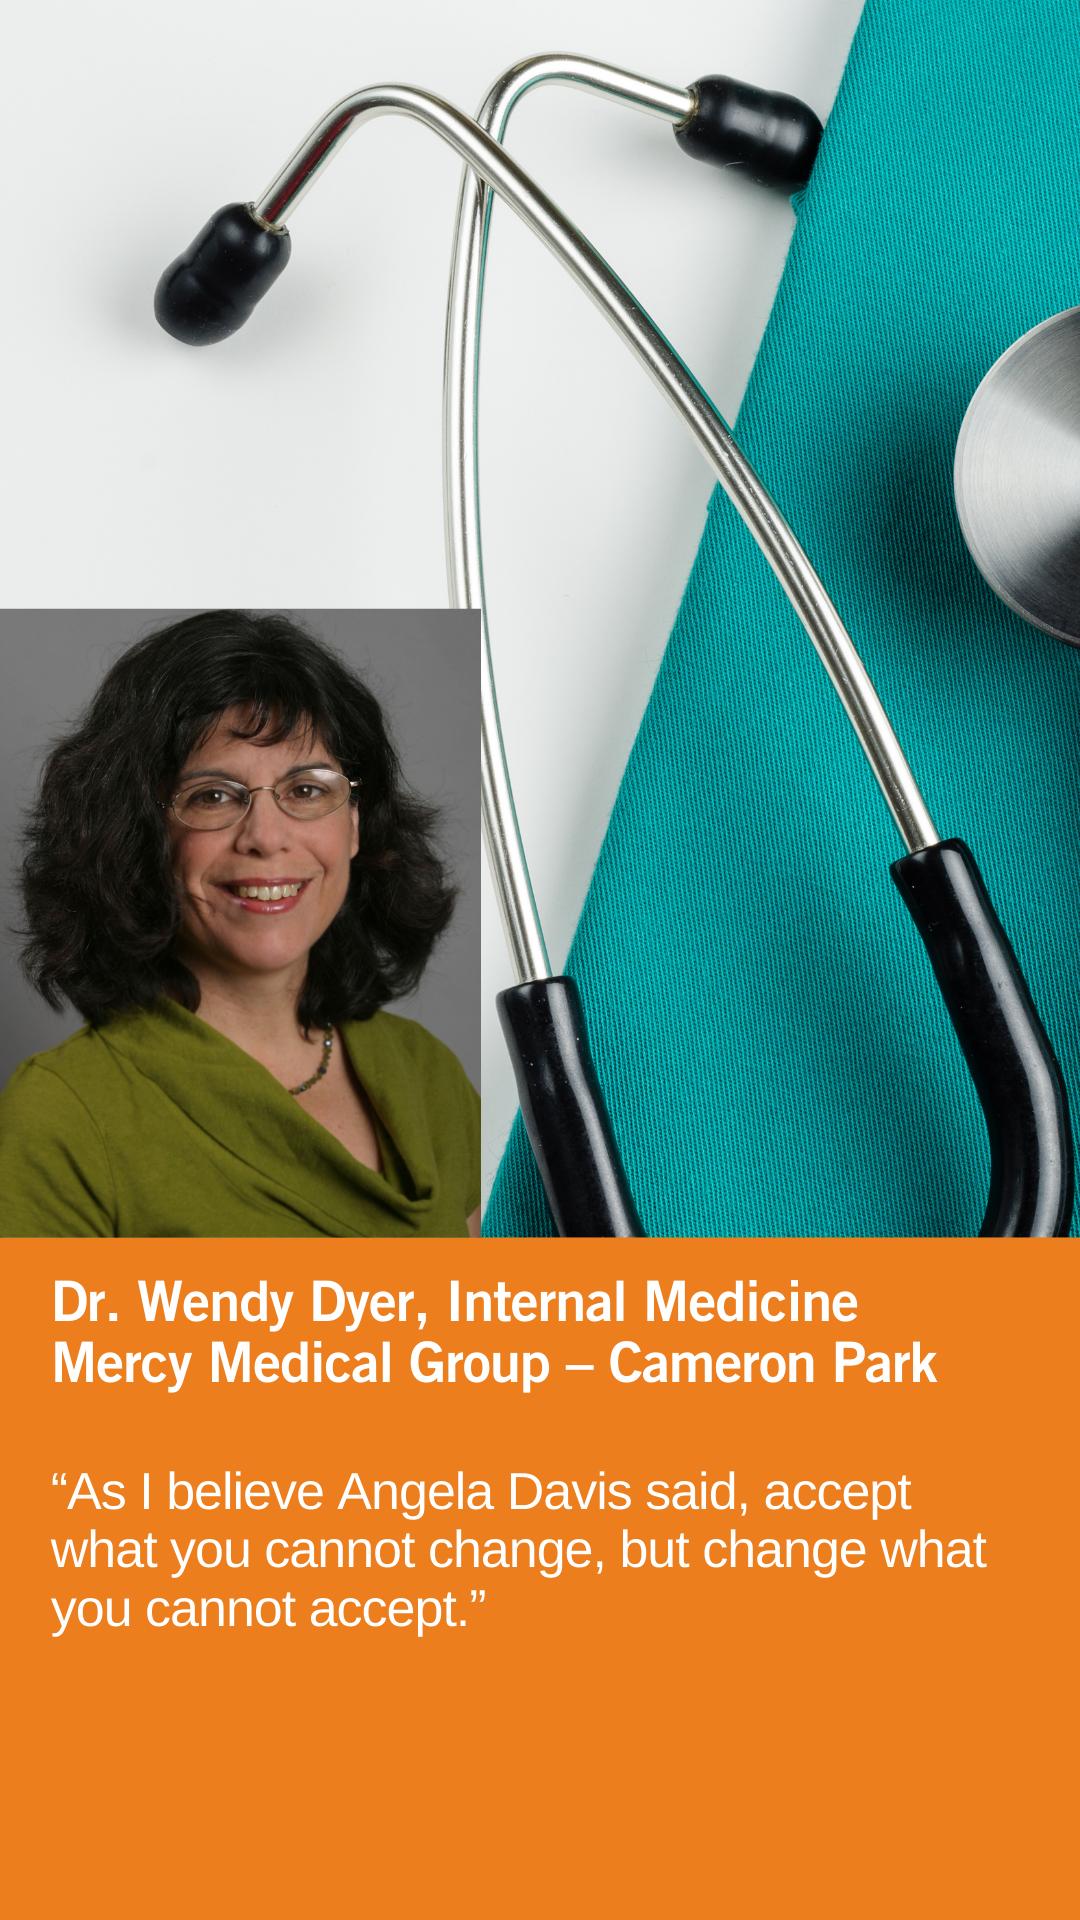 Wendy Dyer, MD, Internal Medicine, Mercy Medical Group